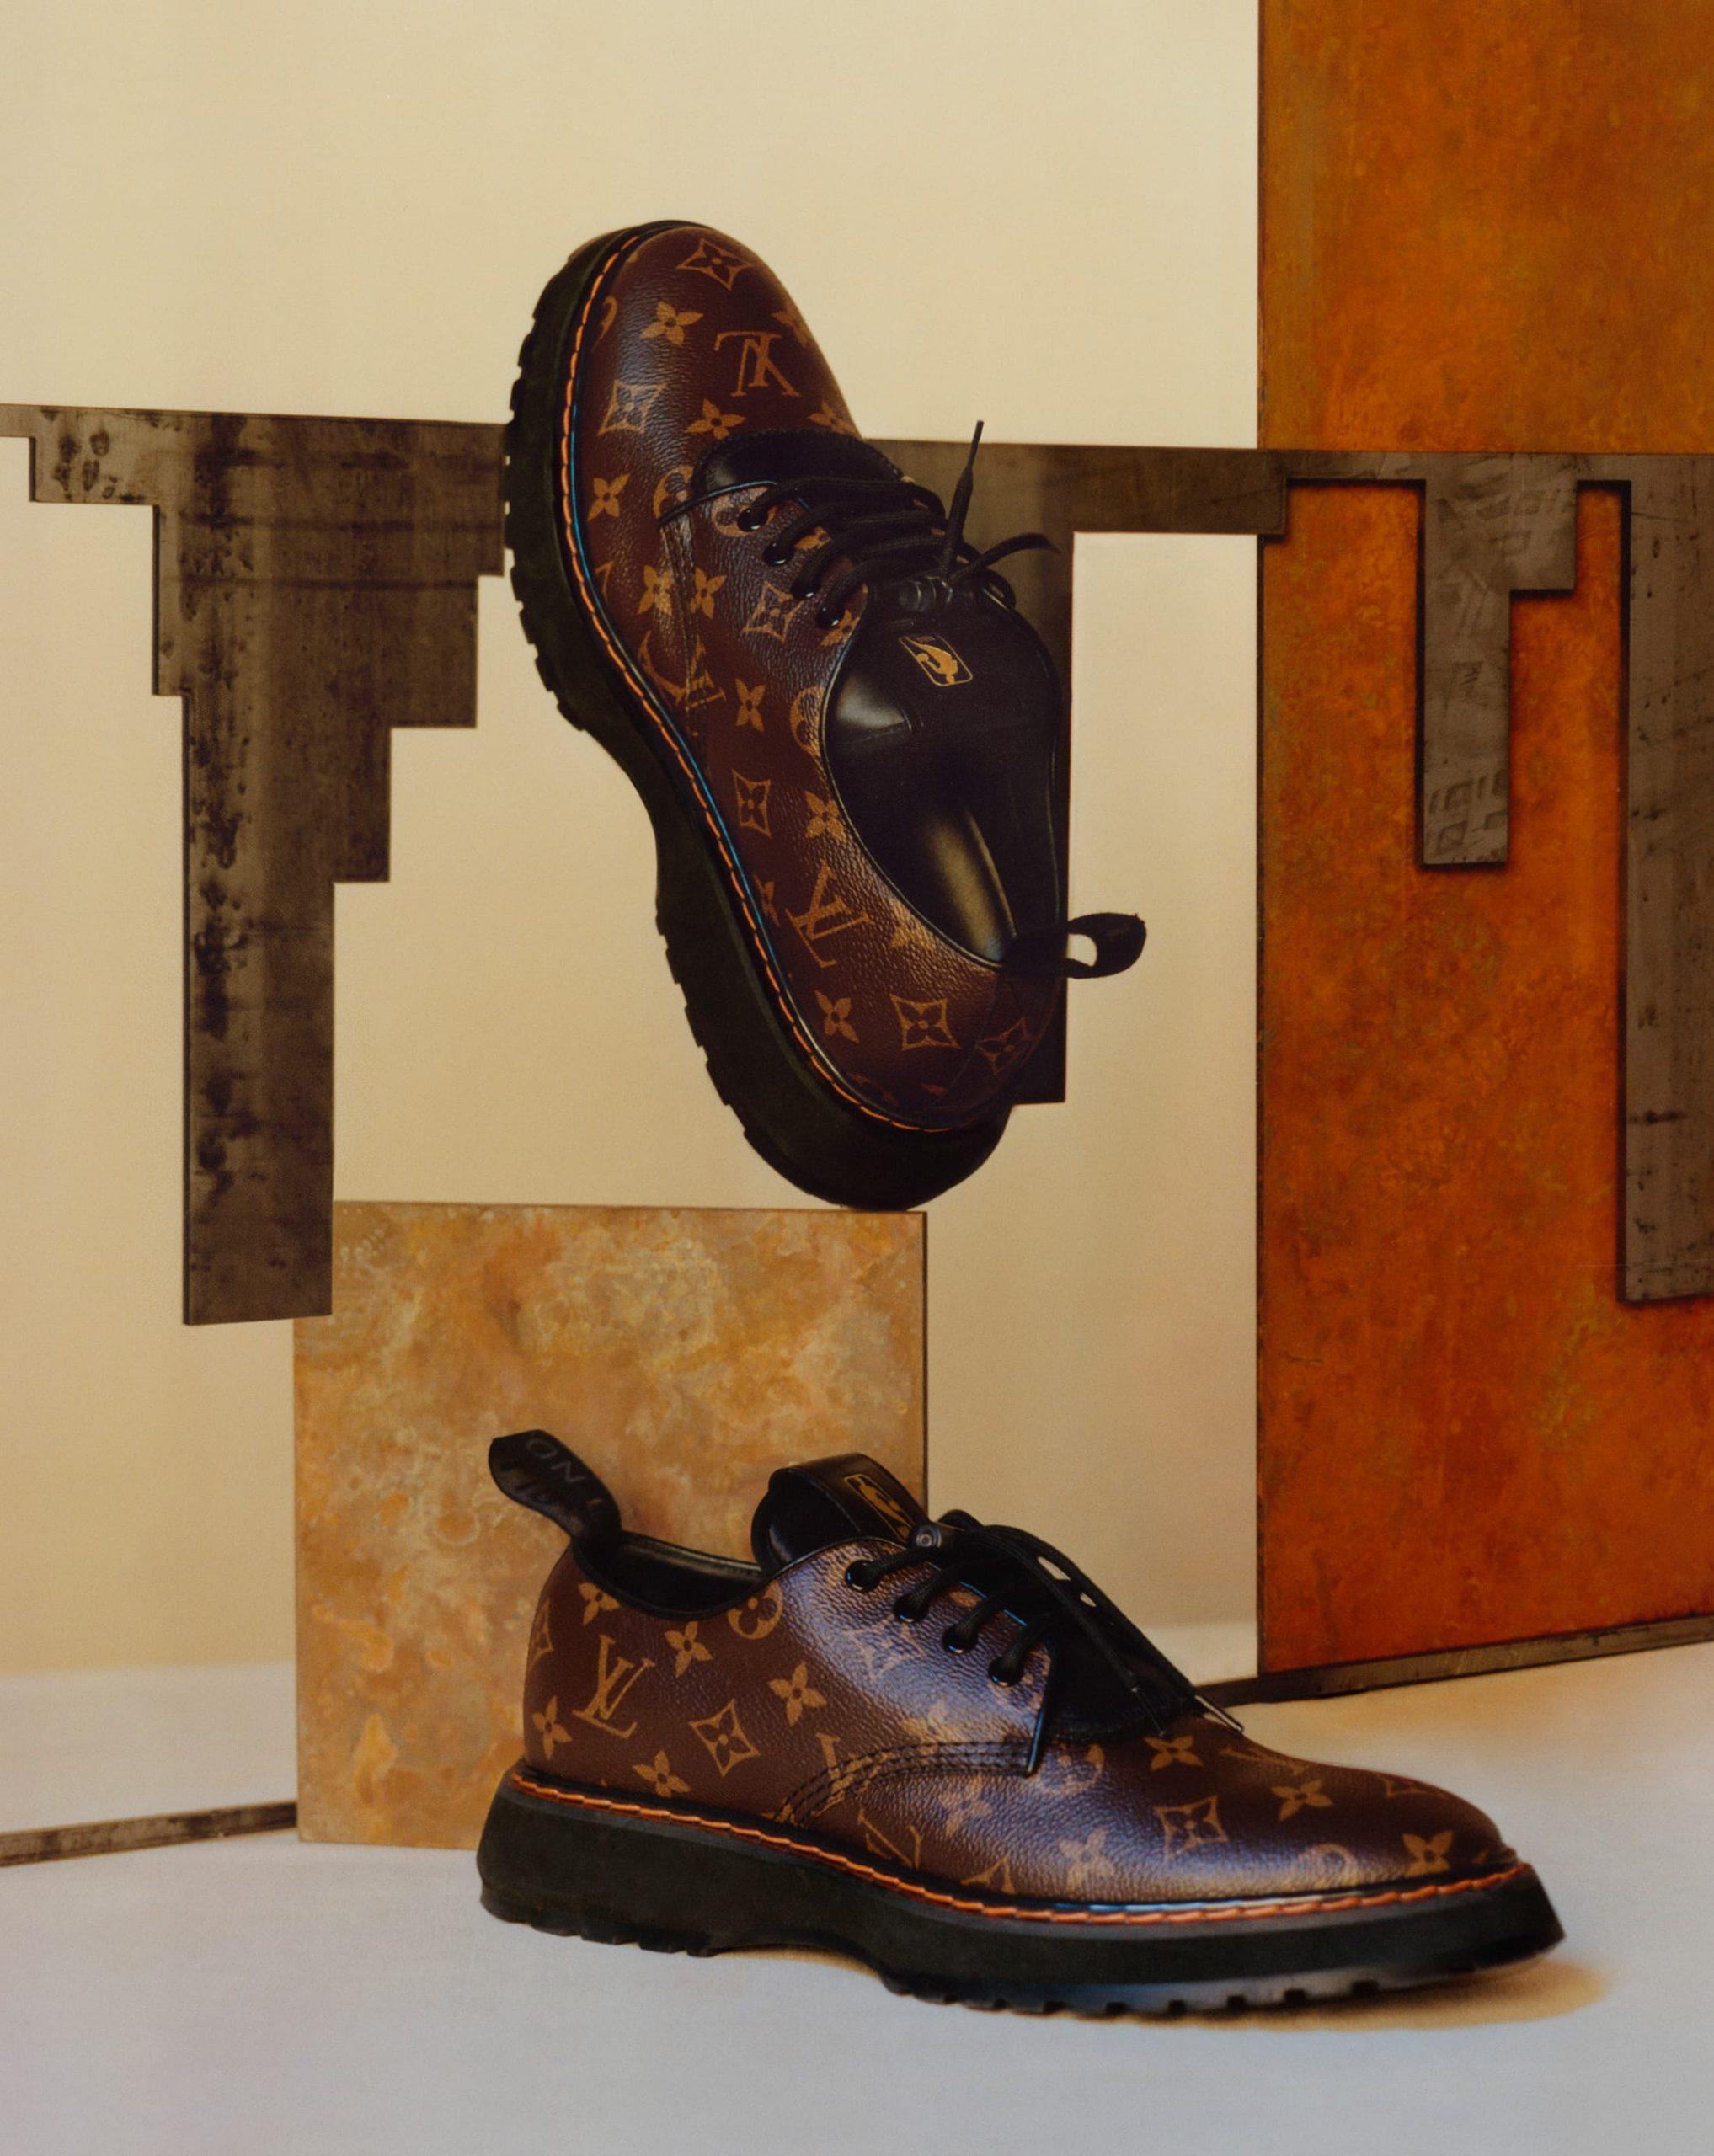 Louis Vuitton Drops 2nd NBA Capsule Collection